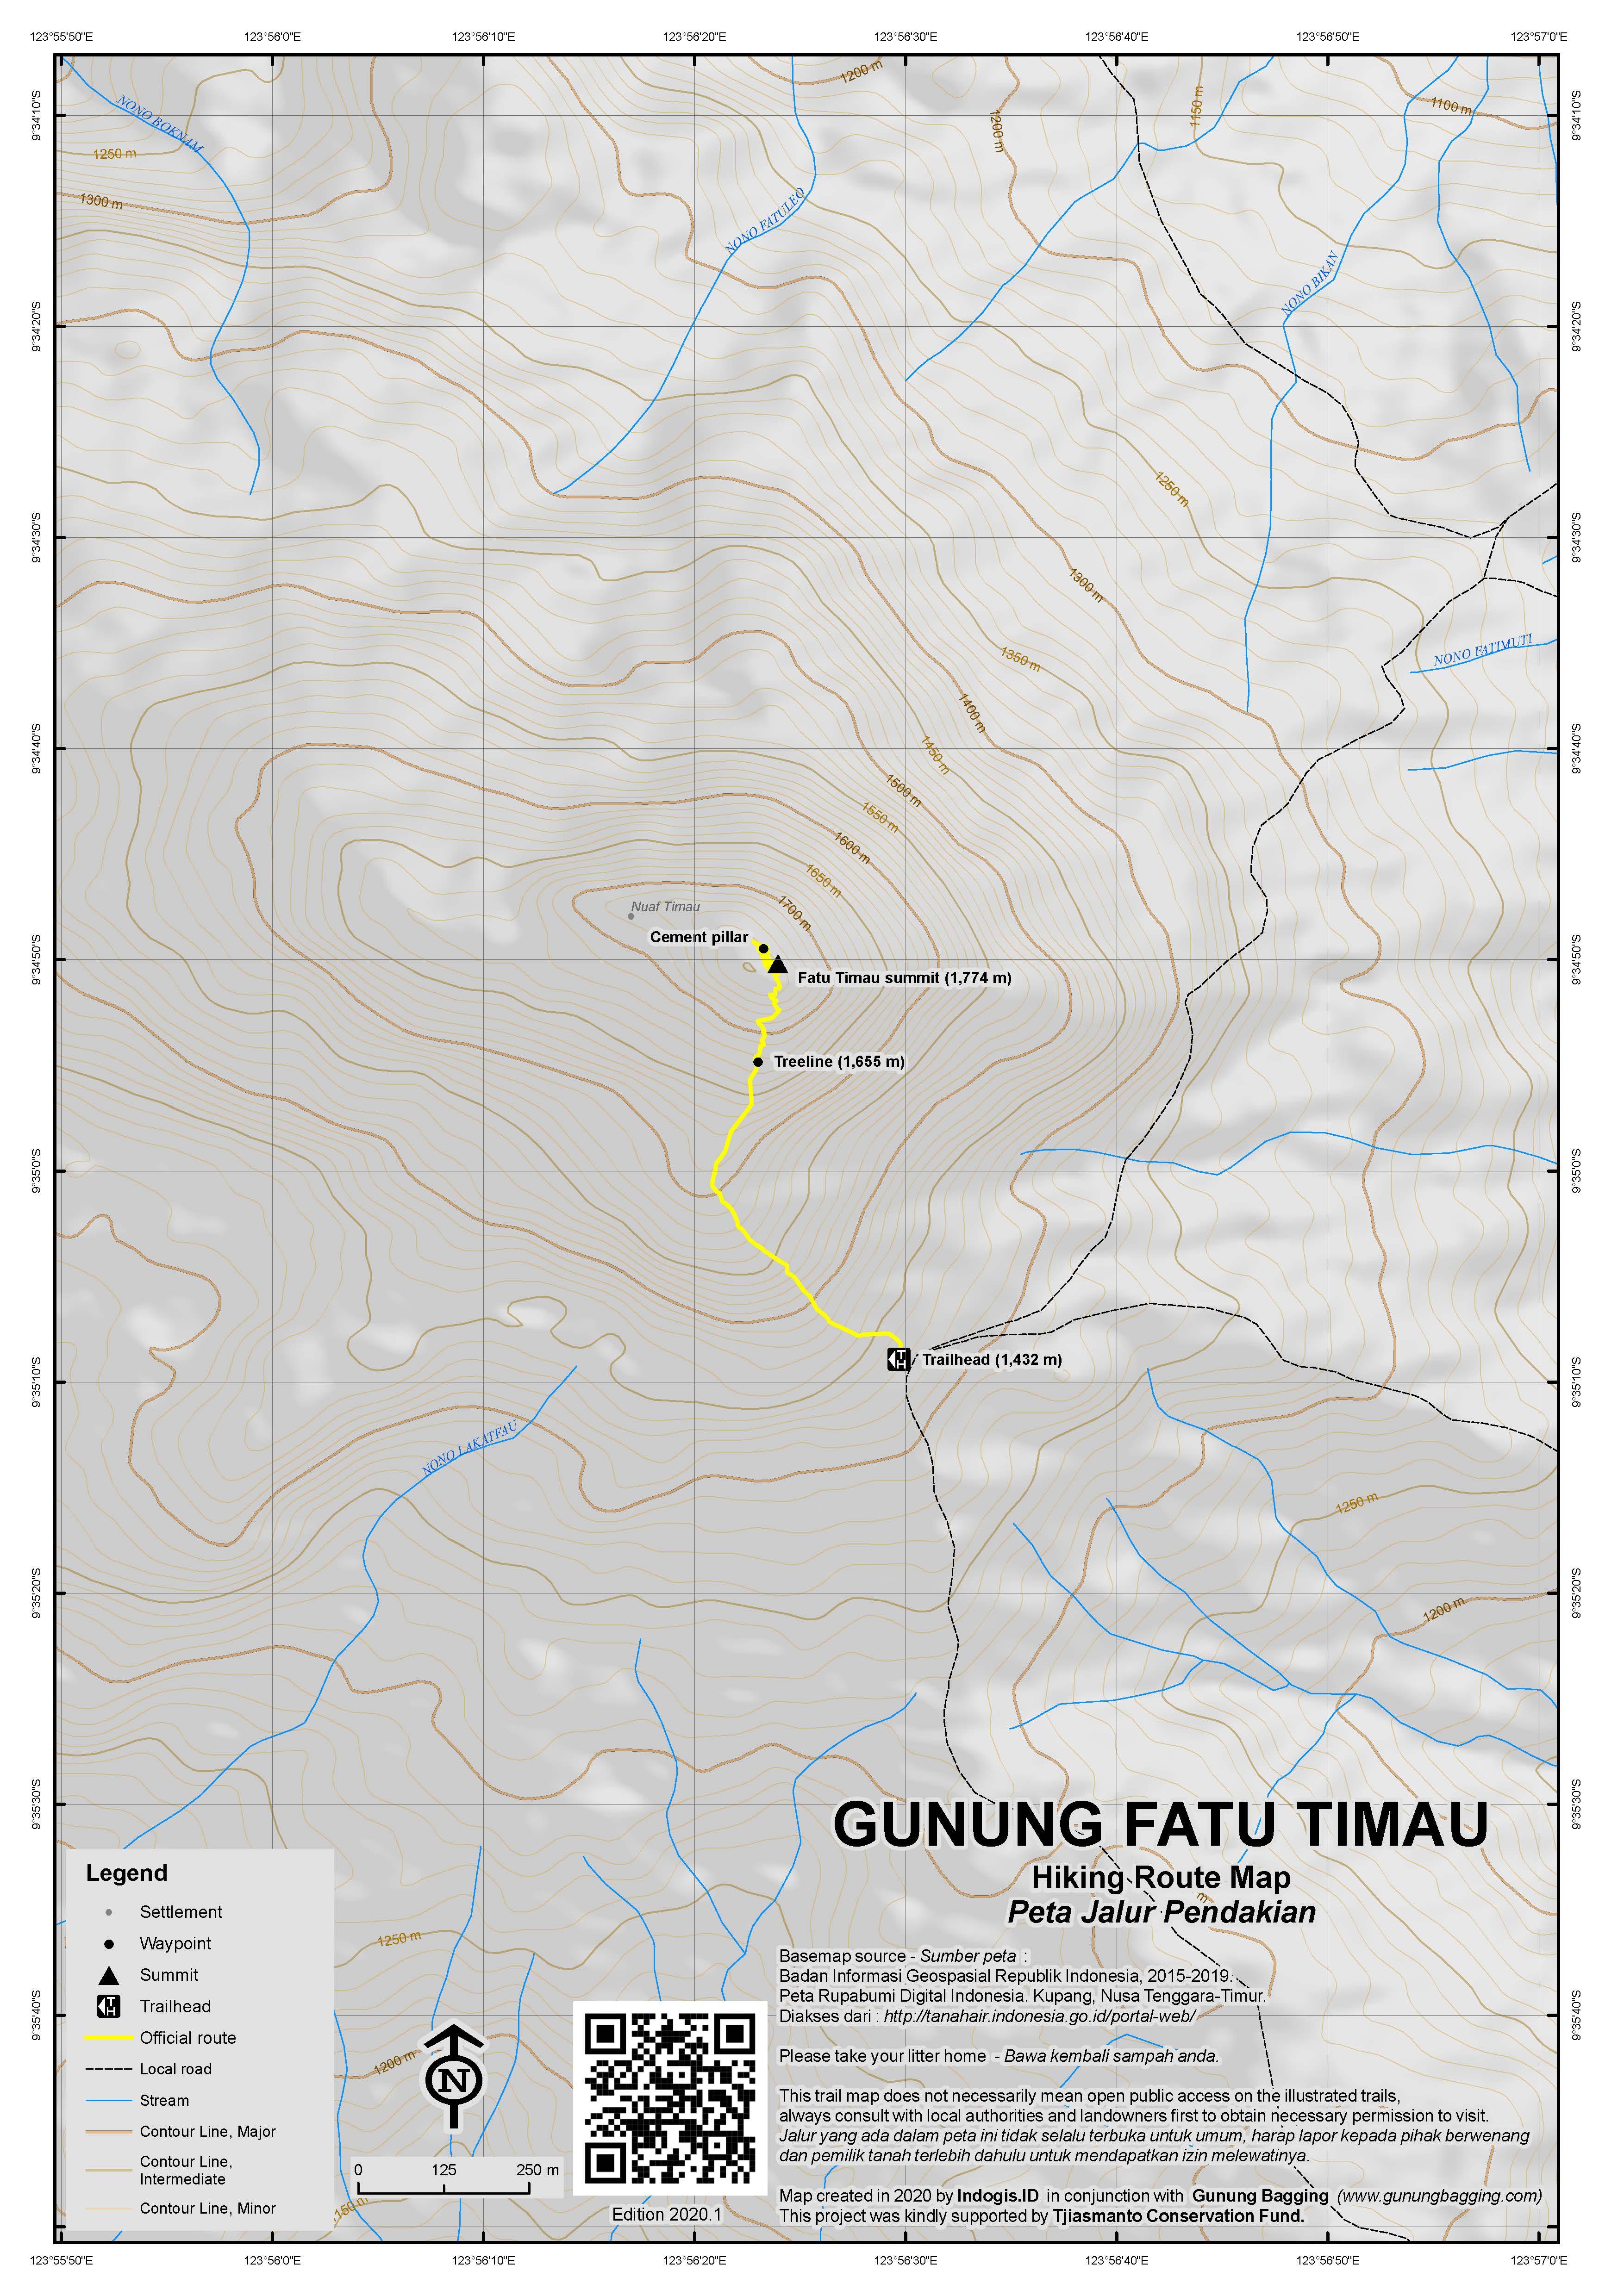 Peta Jalur Pendakian Fatu Timau